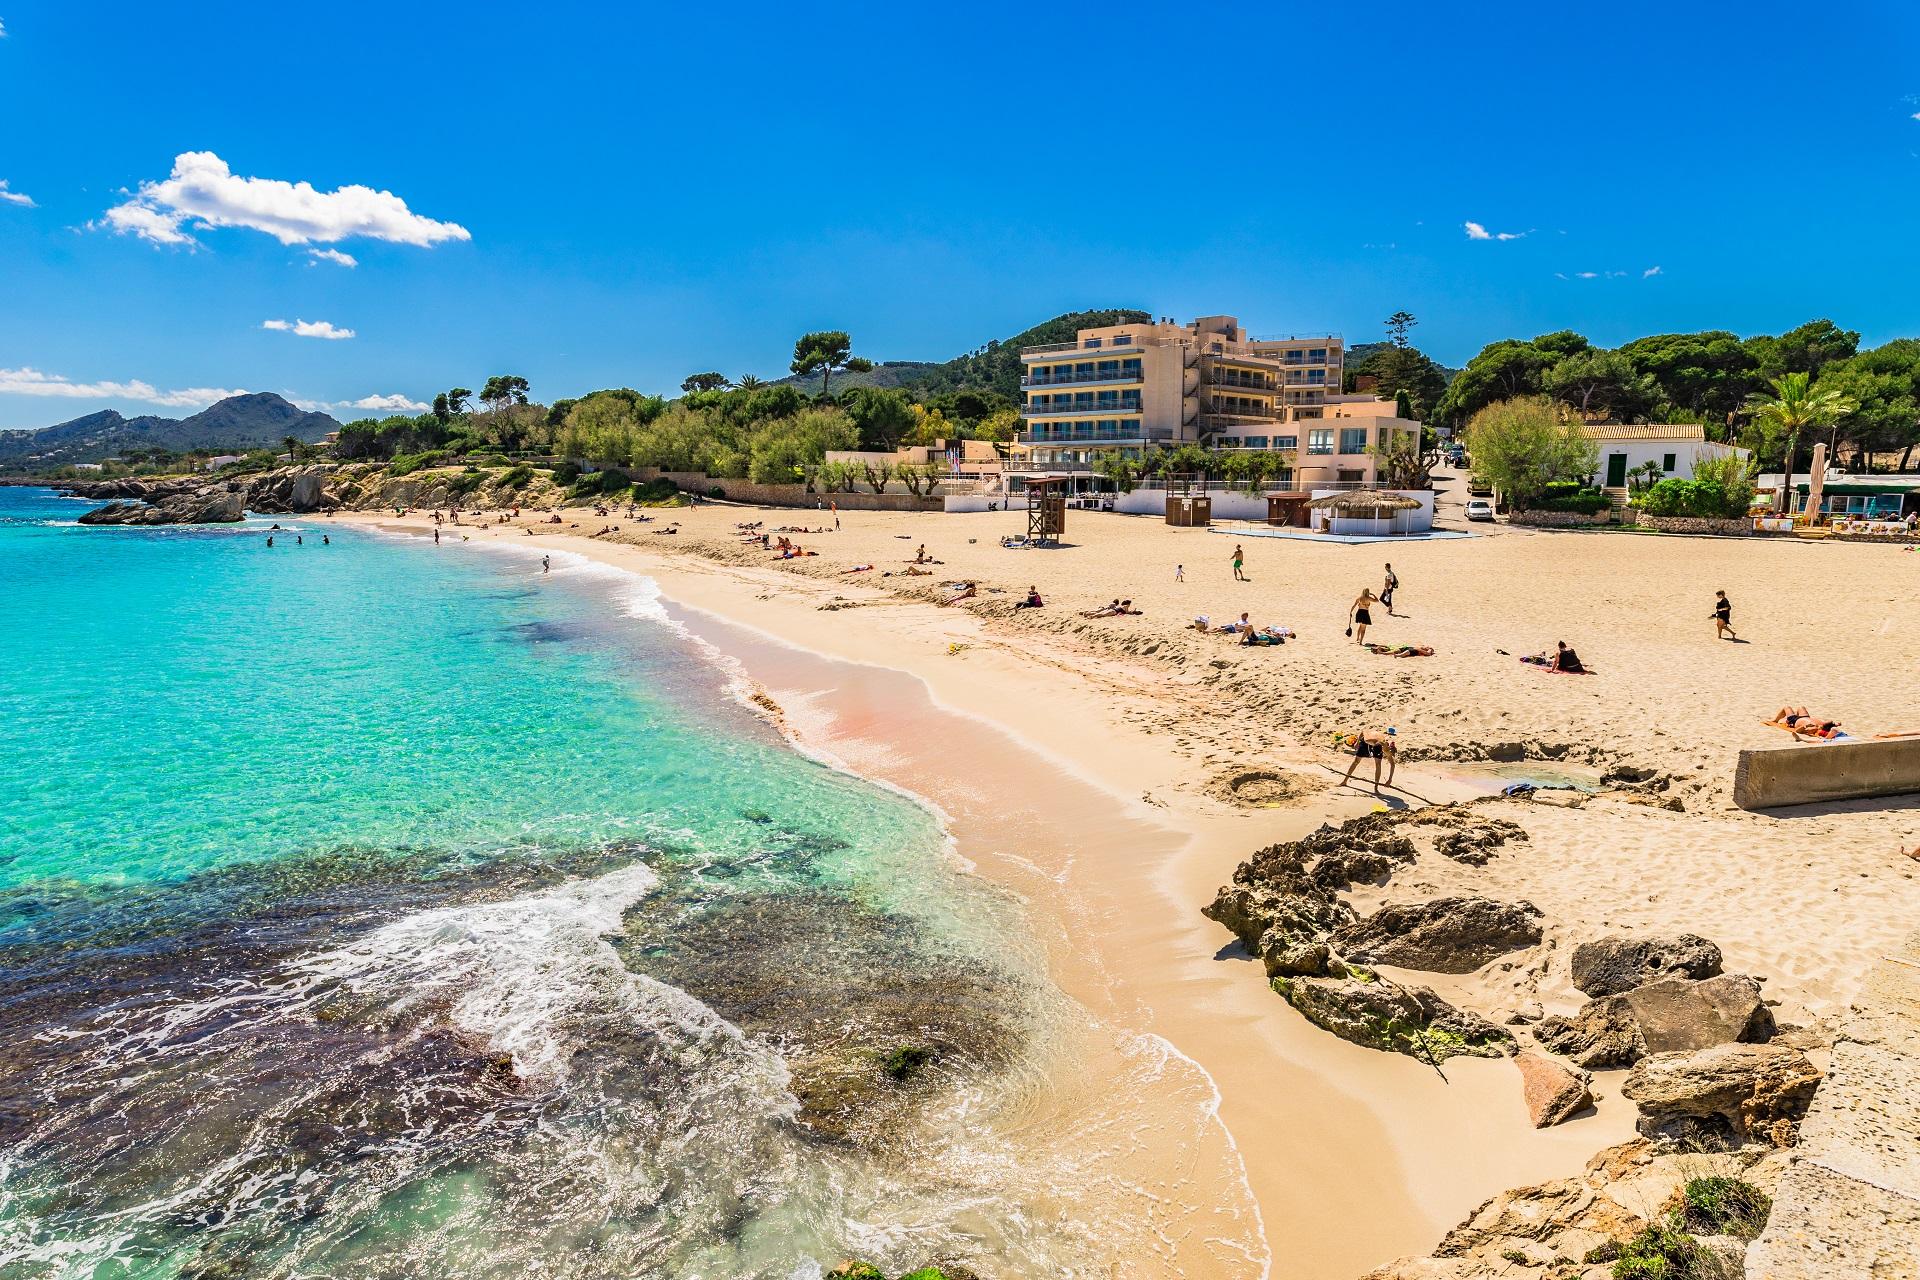 Allsun Hotel Mallorca Cala Ratjada